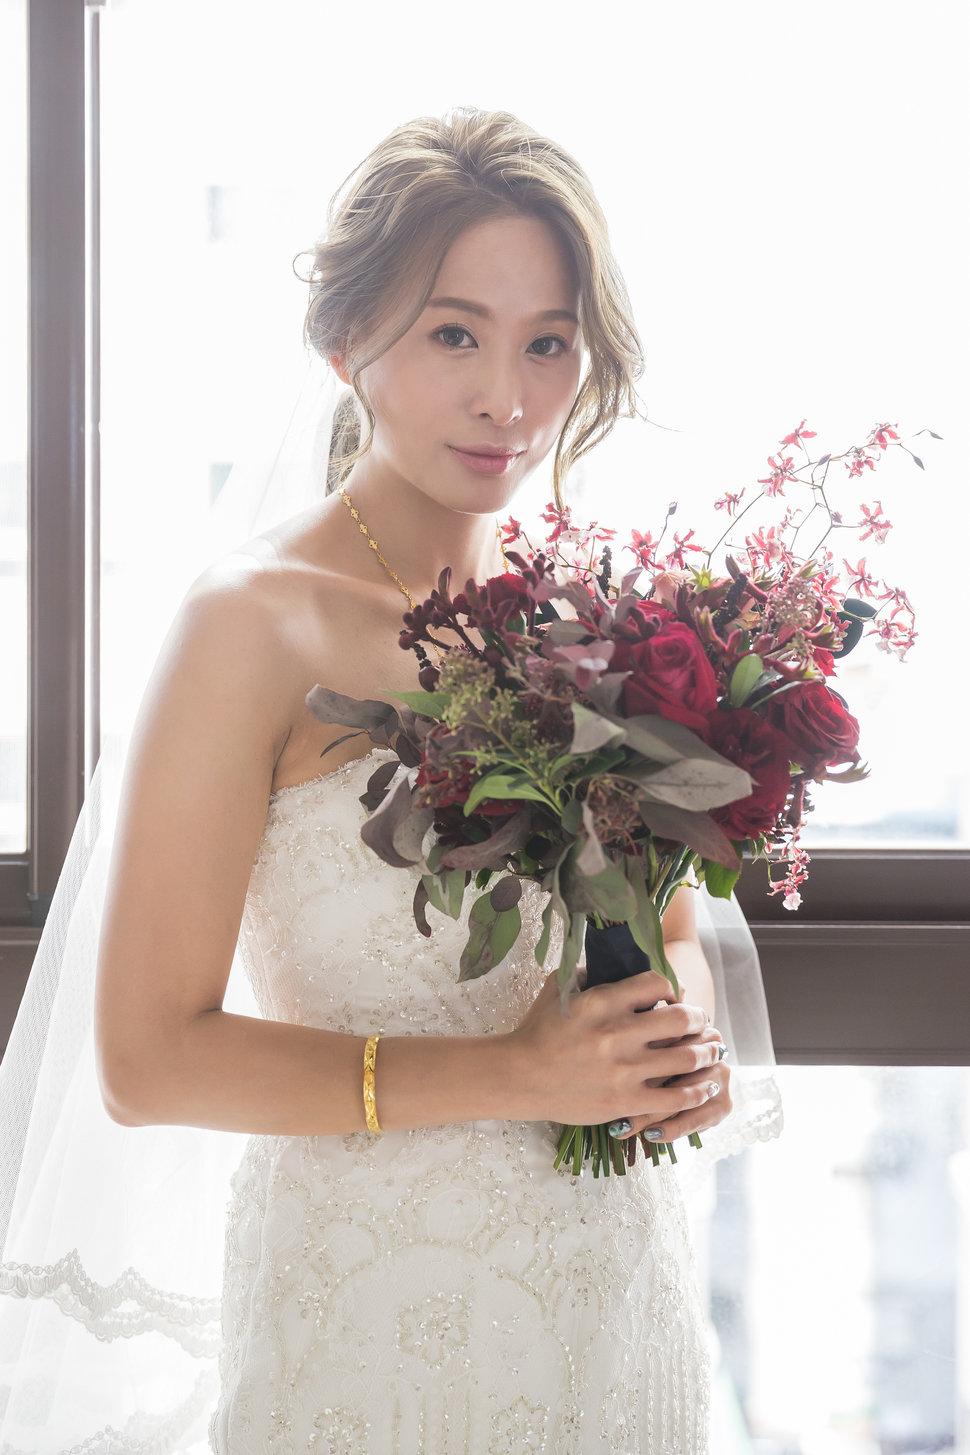 KUBA4334 - 野孩子攝影工作室《結婚吧》